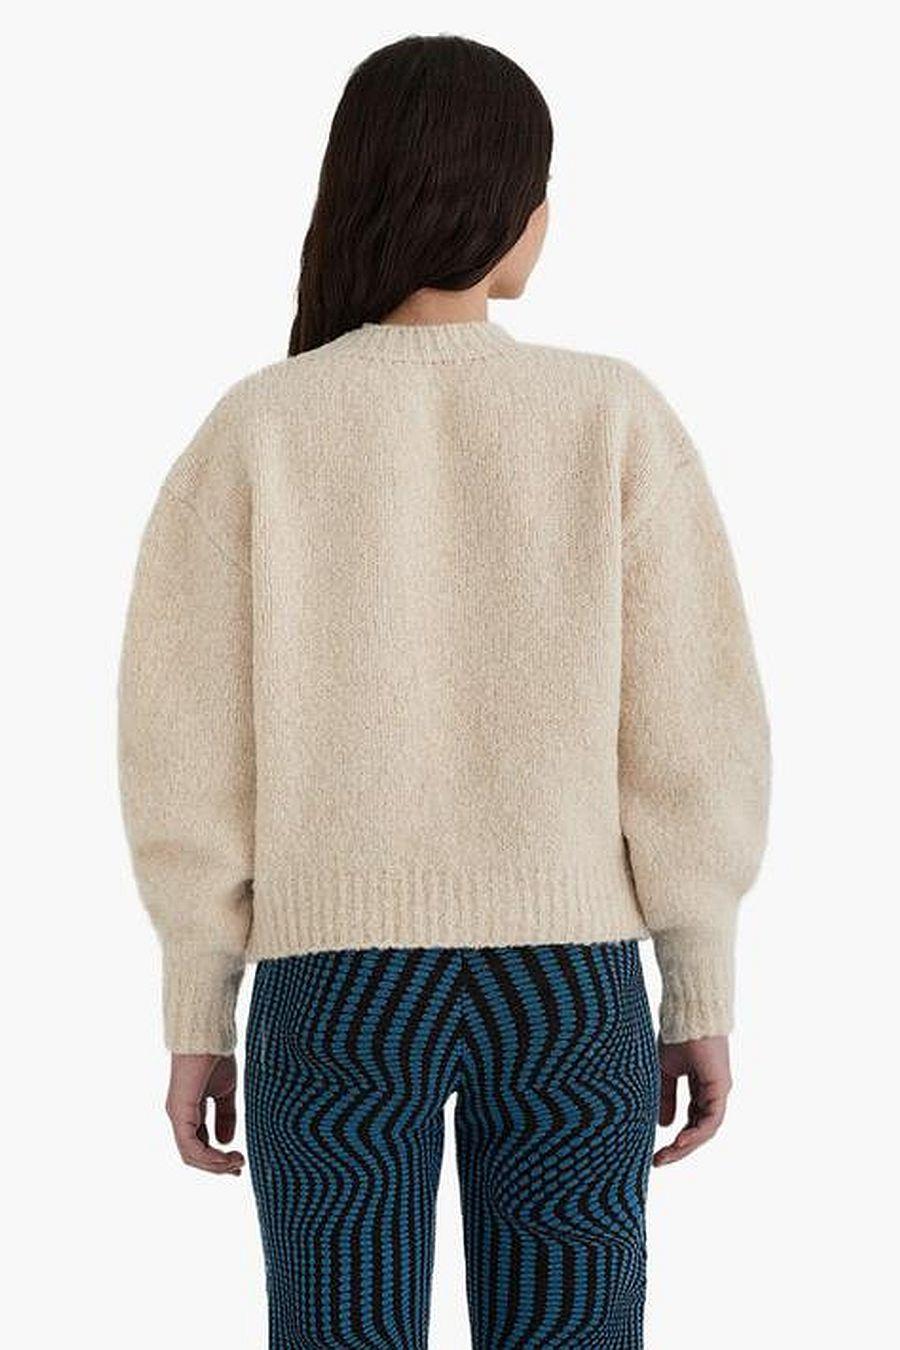 Paloma Wool Anita Sweater - Ecru